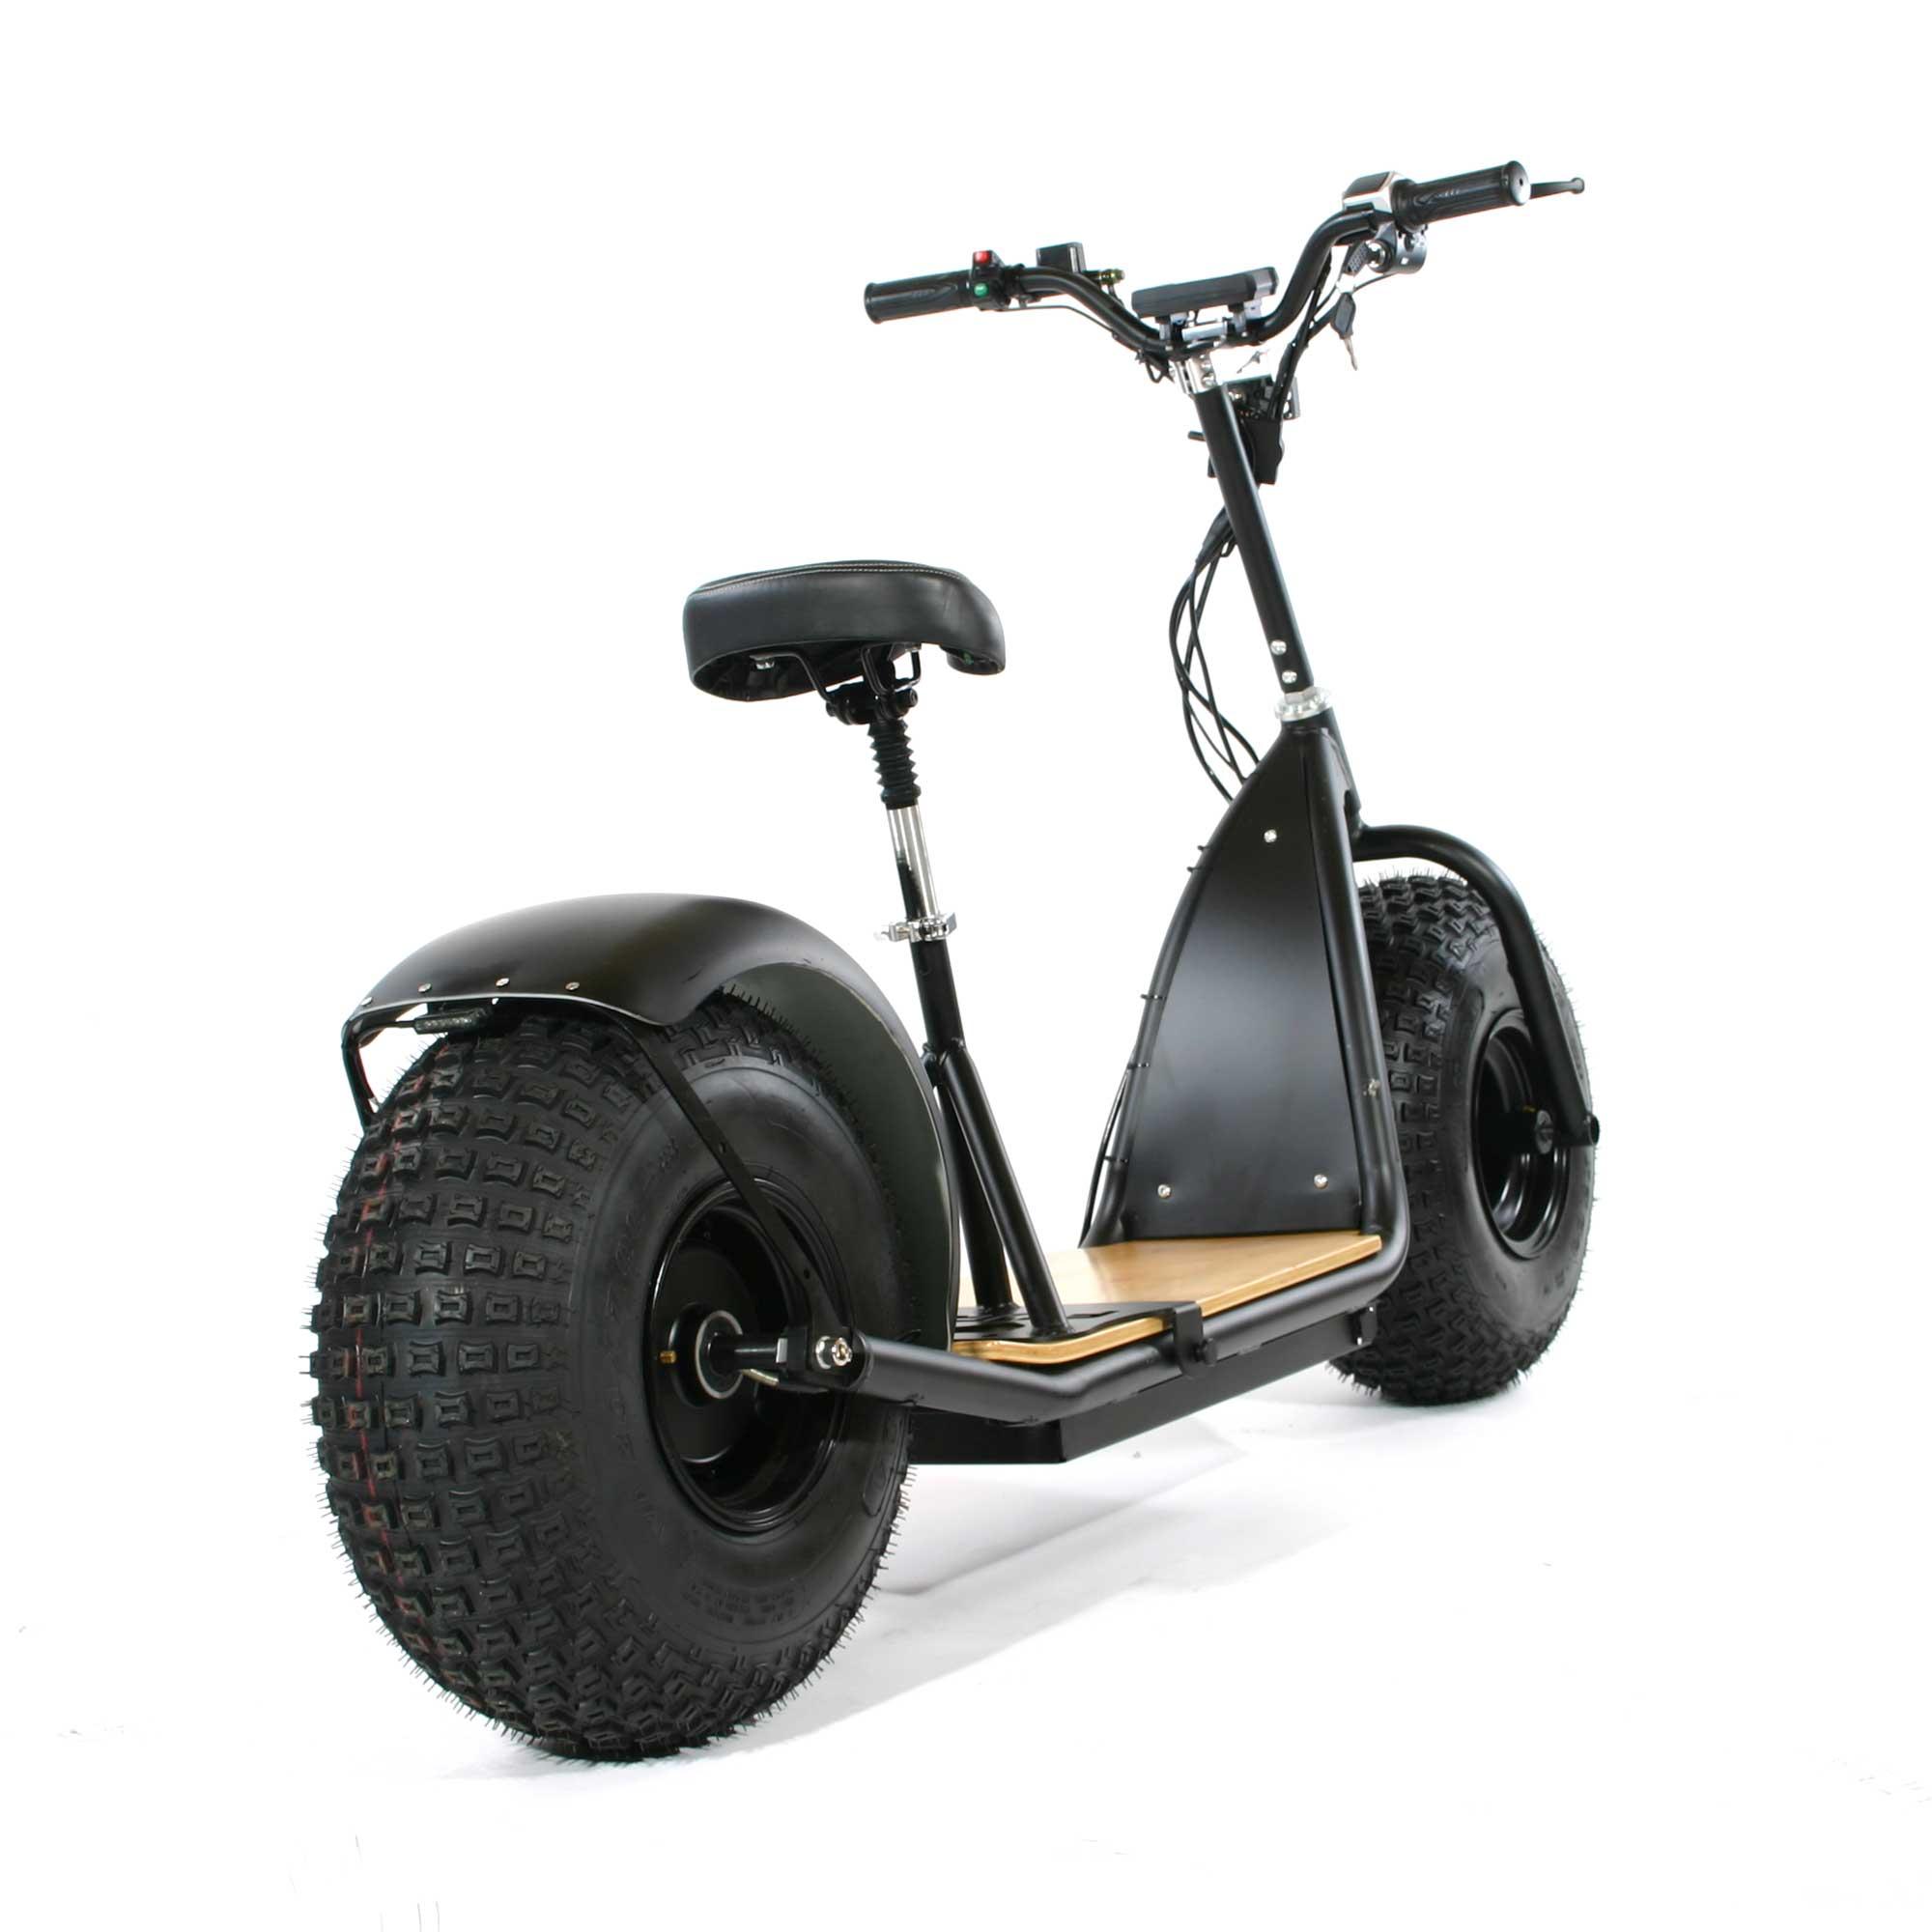 forca knumo 48v 1000w sxx fat wheel e scooter mit cruise reifenprofil e scooter e scooter ohne. Black Bedroom Furniture Sets. Home Design Ideas